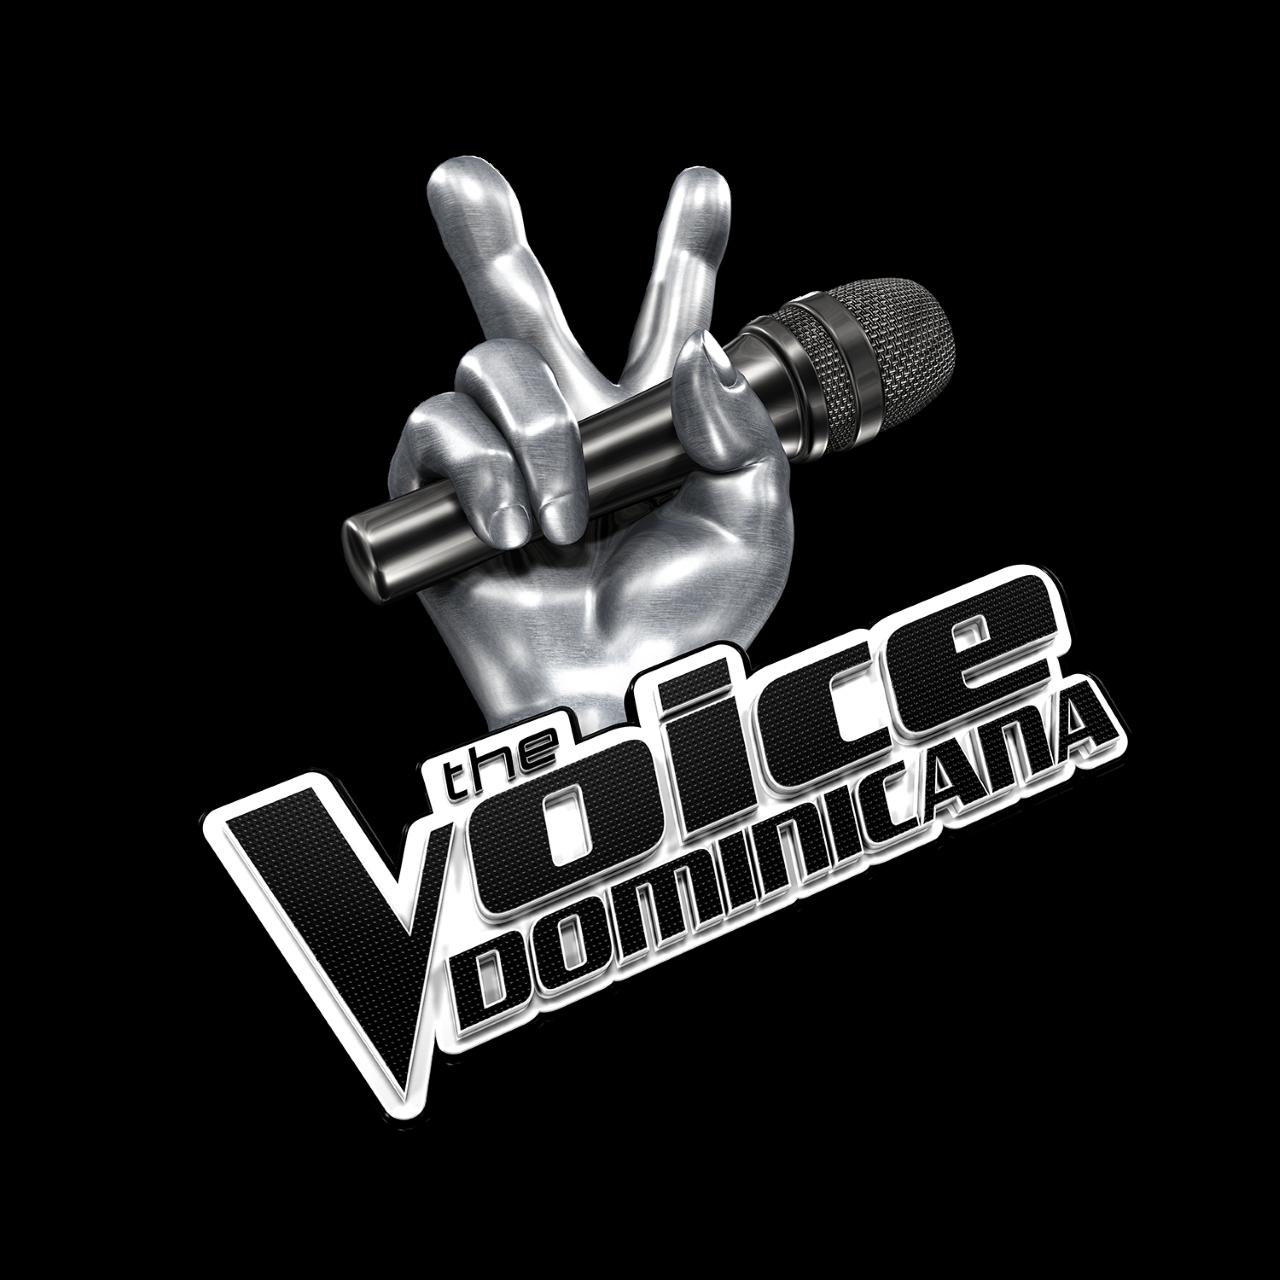 1,200 personas acudirán a casting presencial de The Voice Dominicana en Santo Domingo